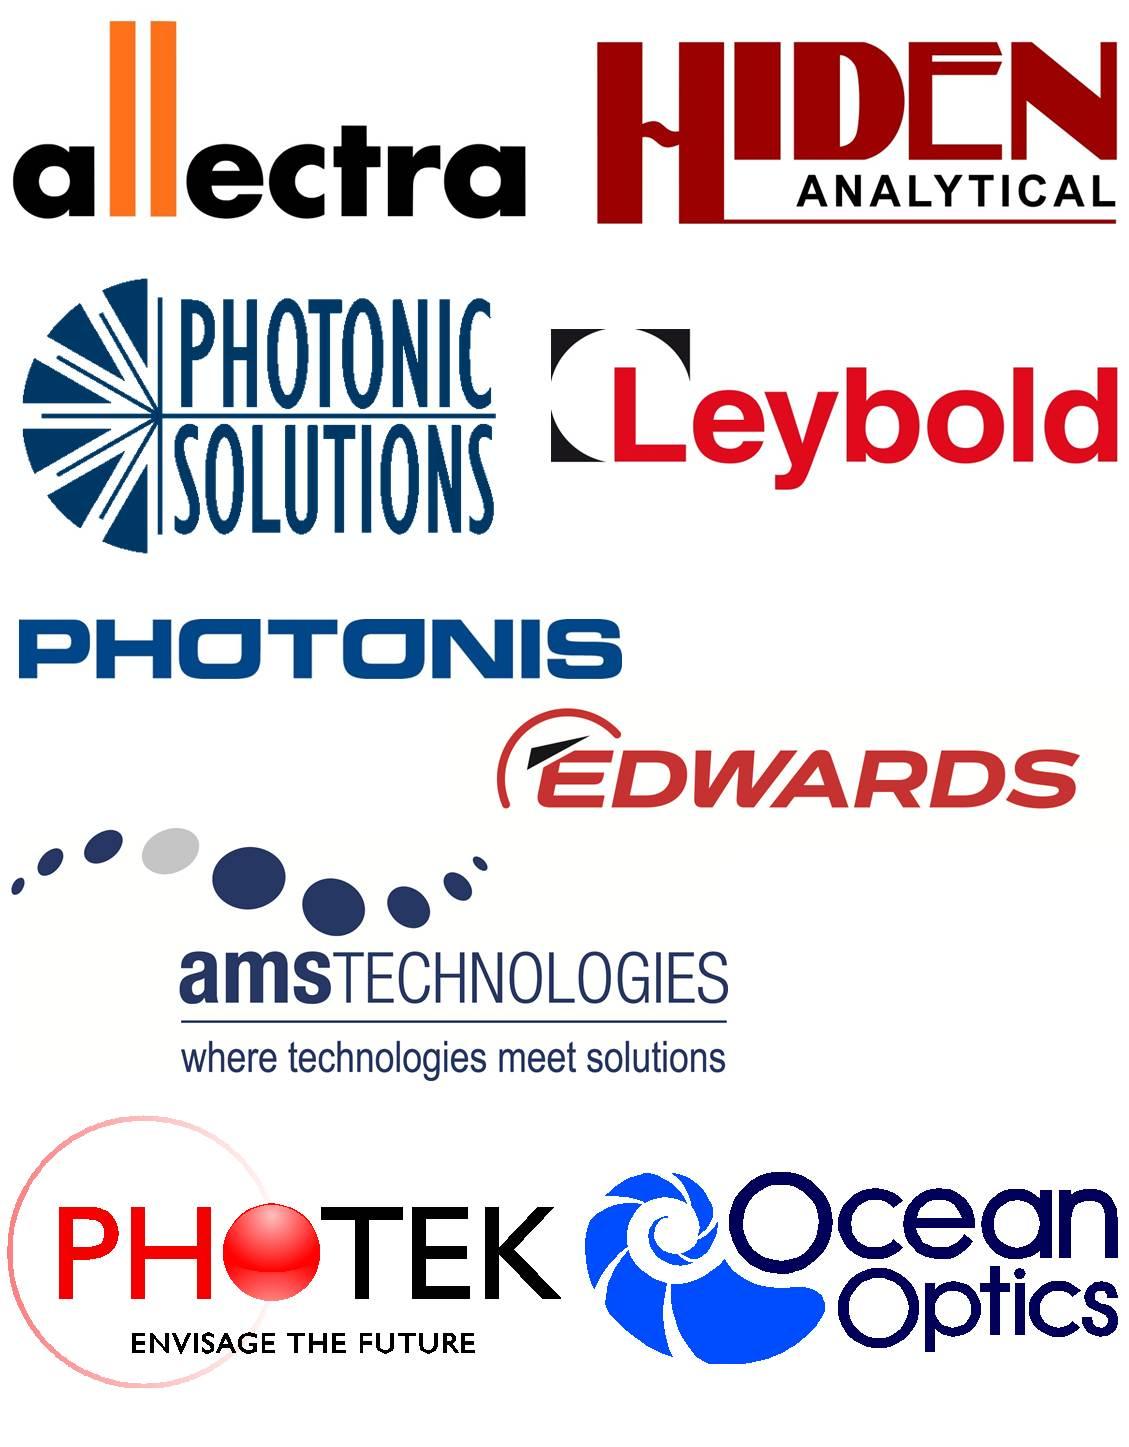 Exhibitor_logos_P1_V3